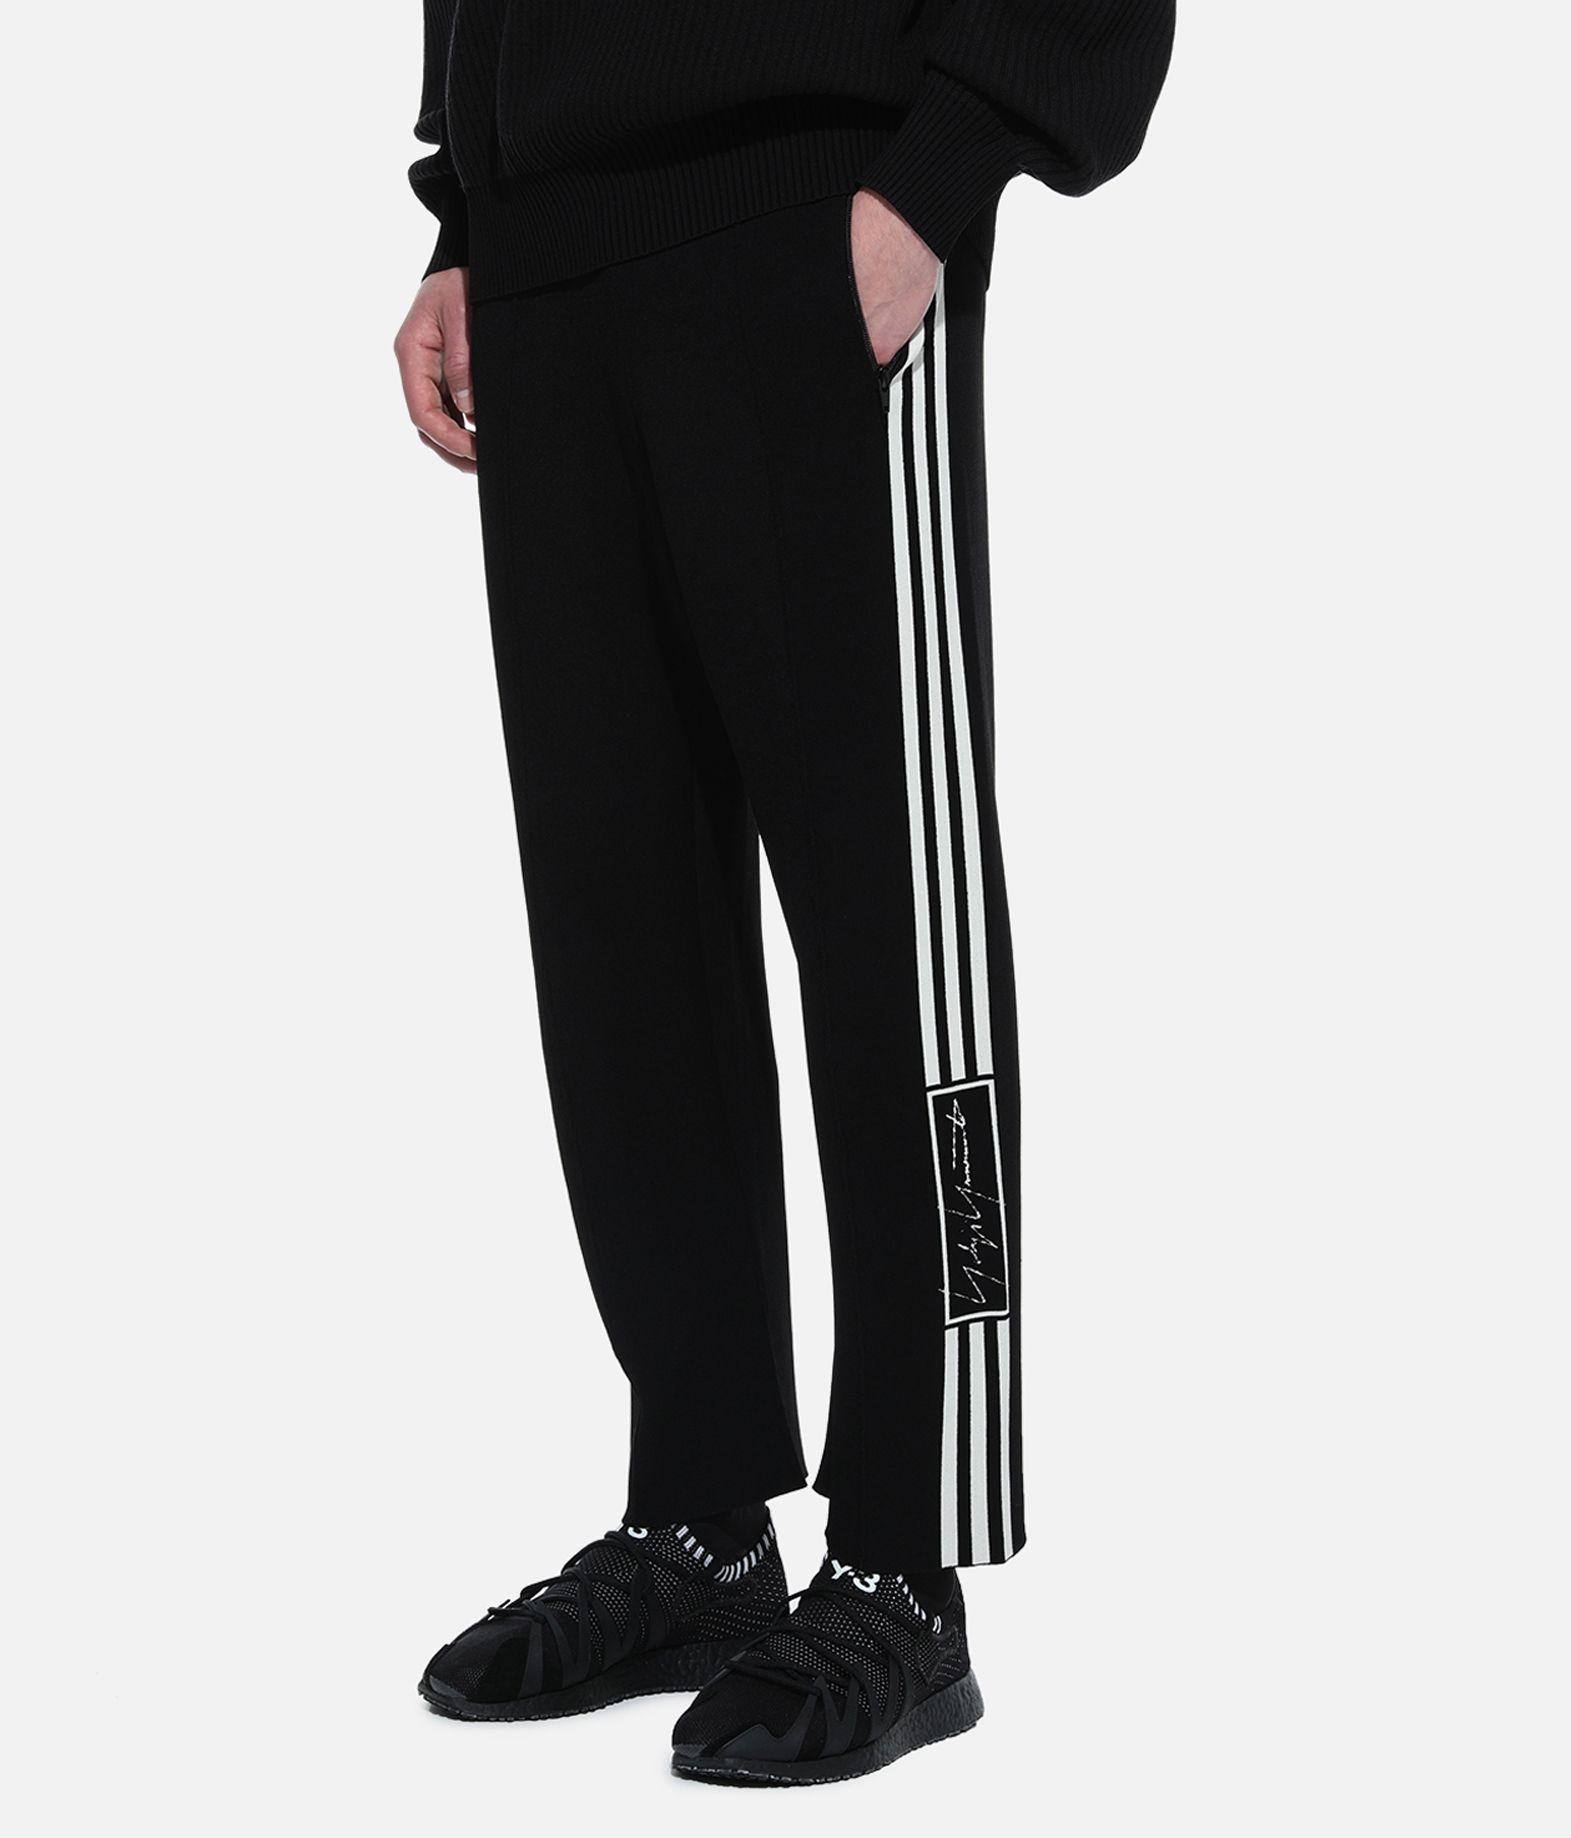 Y-3 Y-3 Tech Knit Wide Pants Casual pants Man e